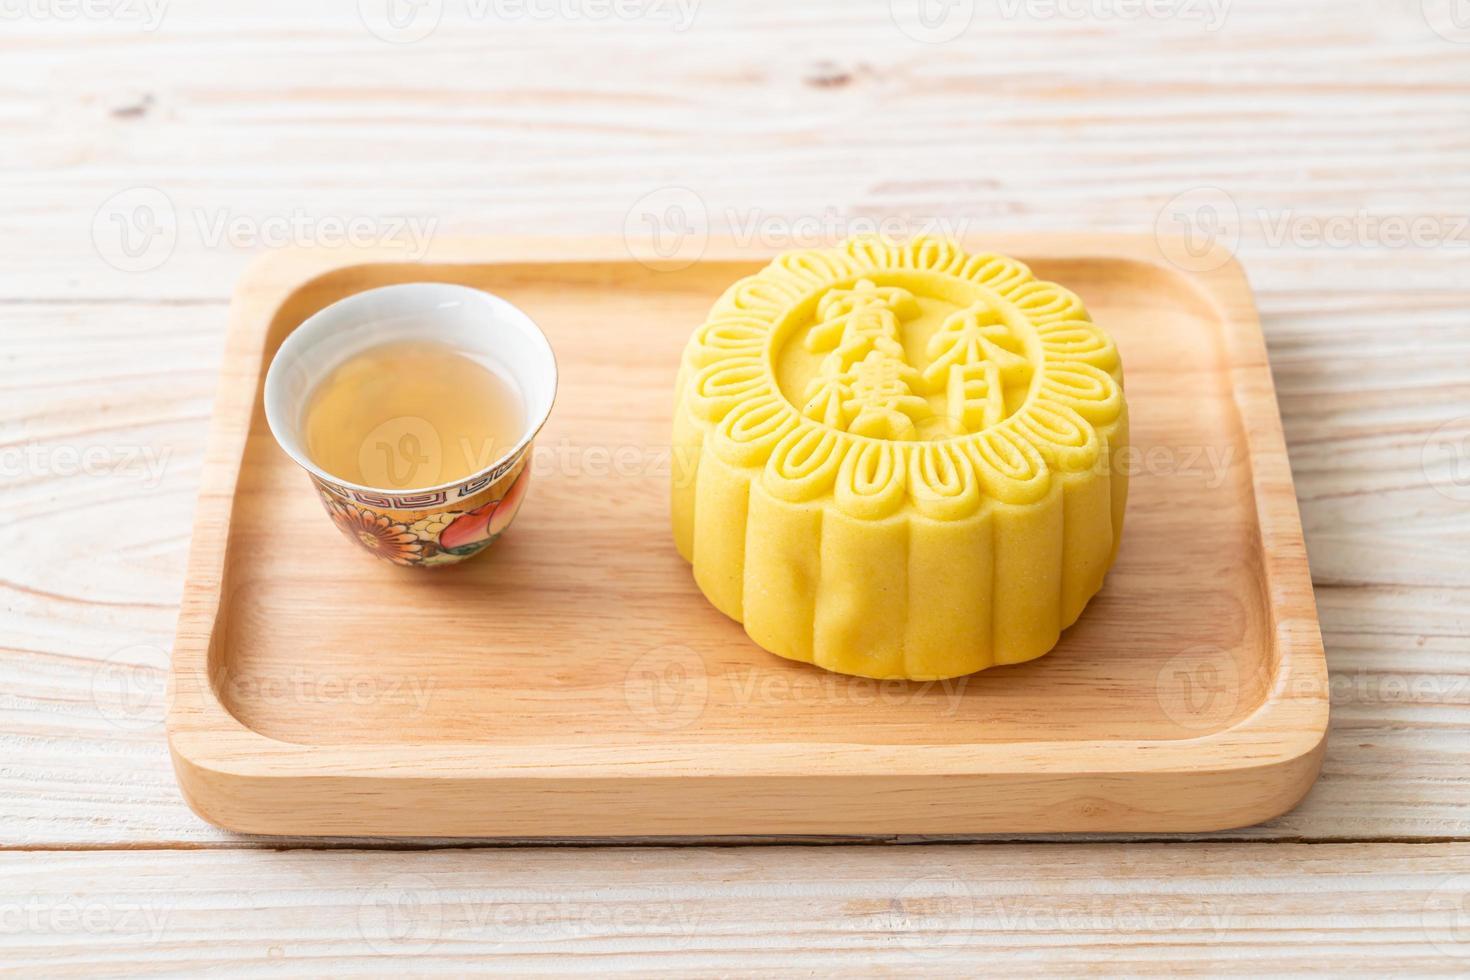 chinesischer mondkuchen puddinggeschmack foto